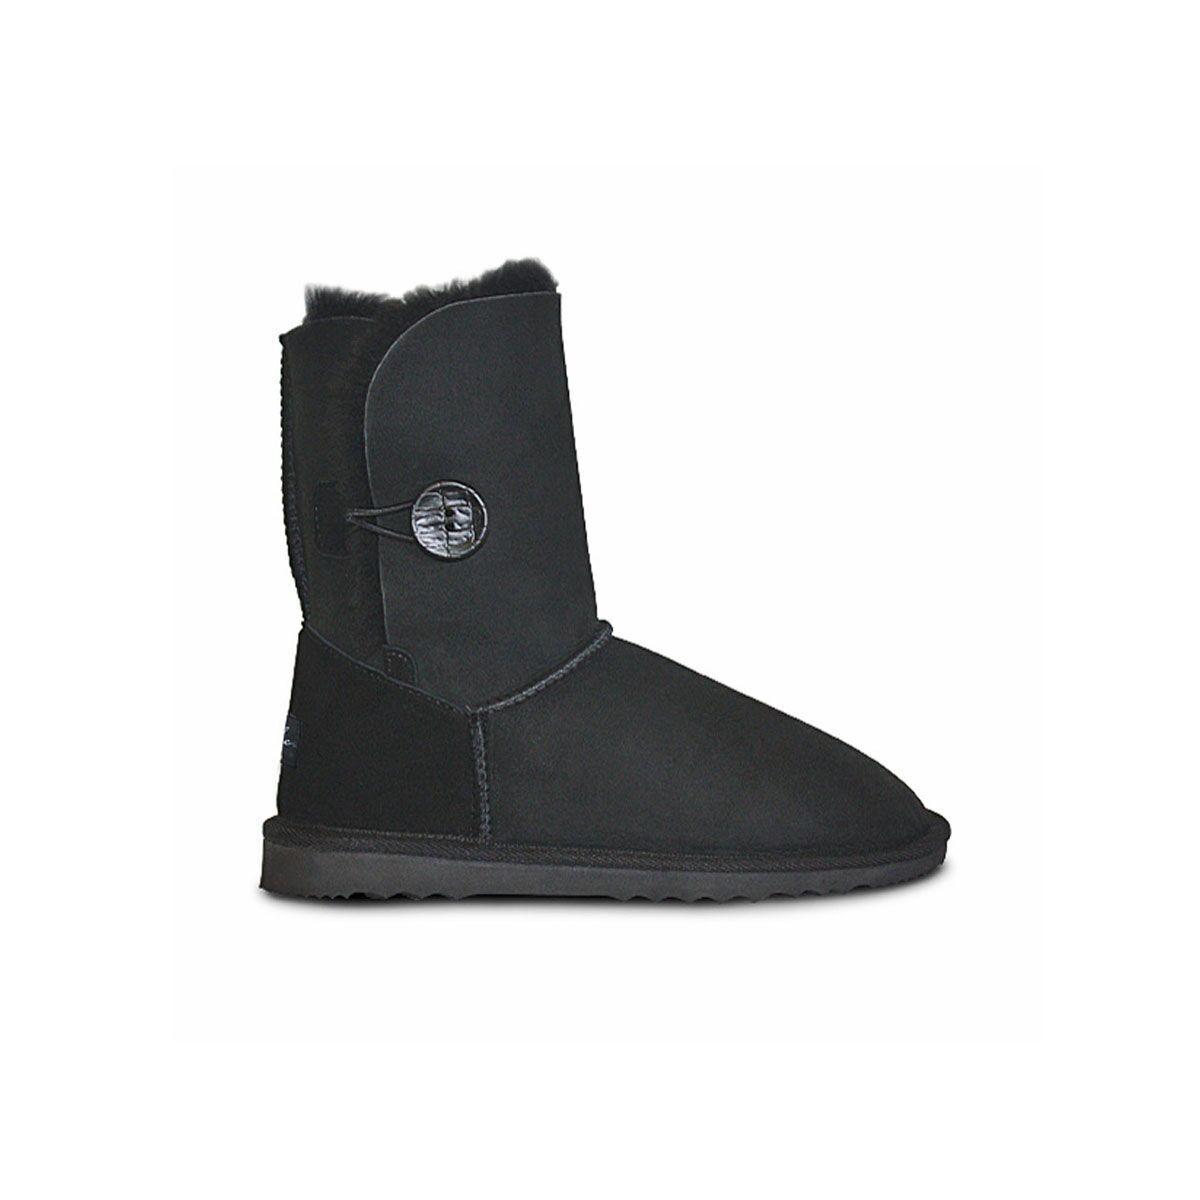 Women Burlee Sheepskin Boot Made In Australia Classic Button Black 100% Original